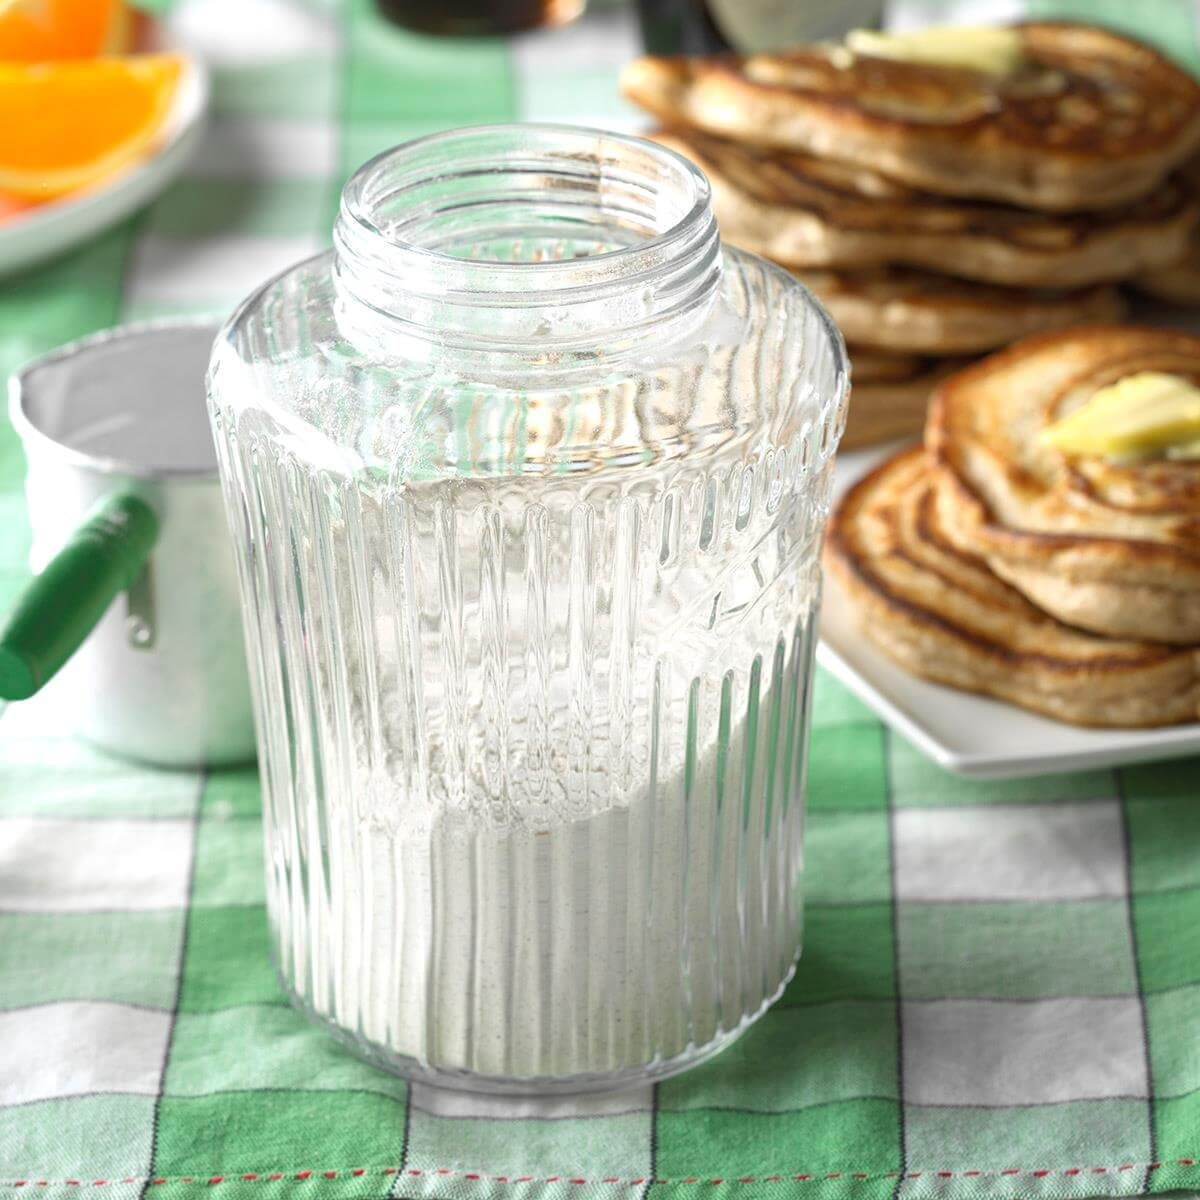 Pancake Mix In A Jar Recipe Taste Of Home